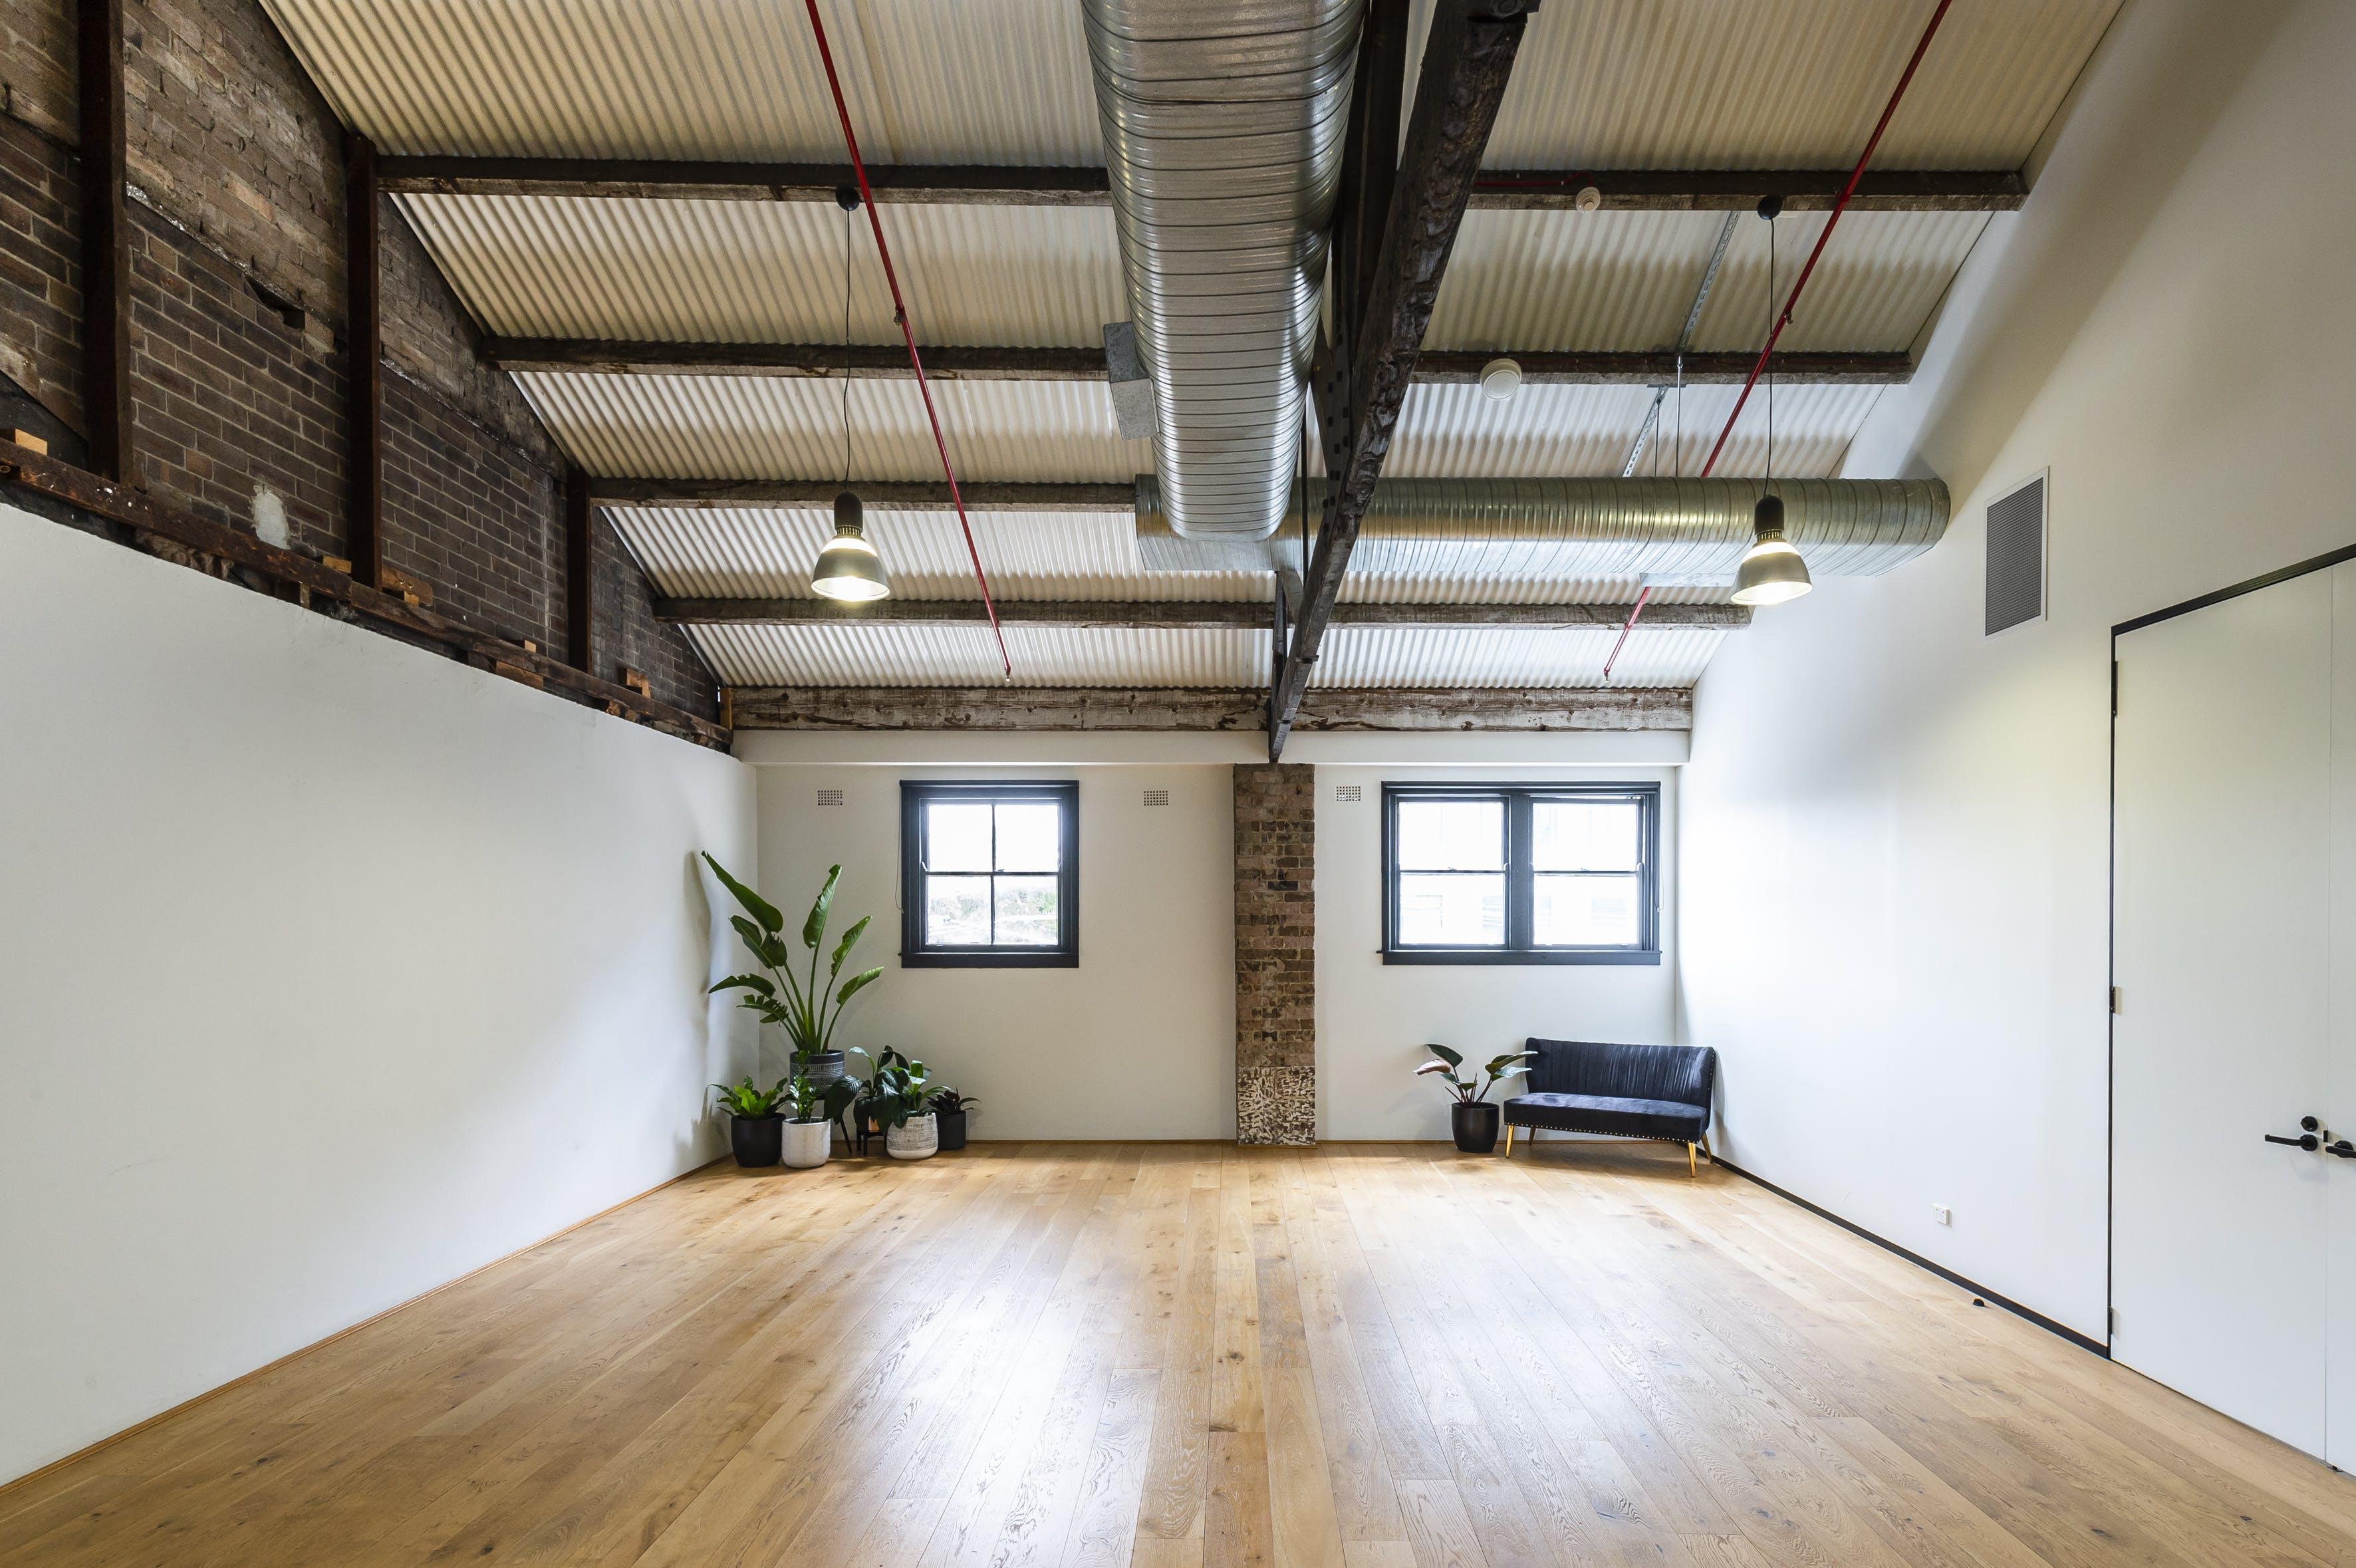 Photography Studio, creative studio at Cohouse Studios, image 1